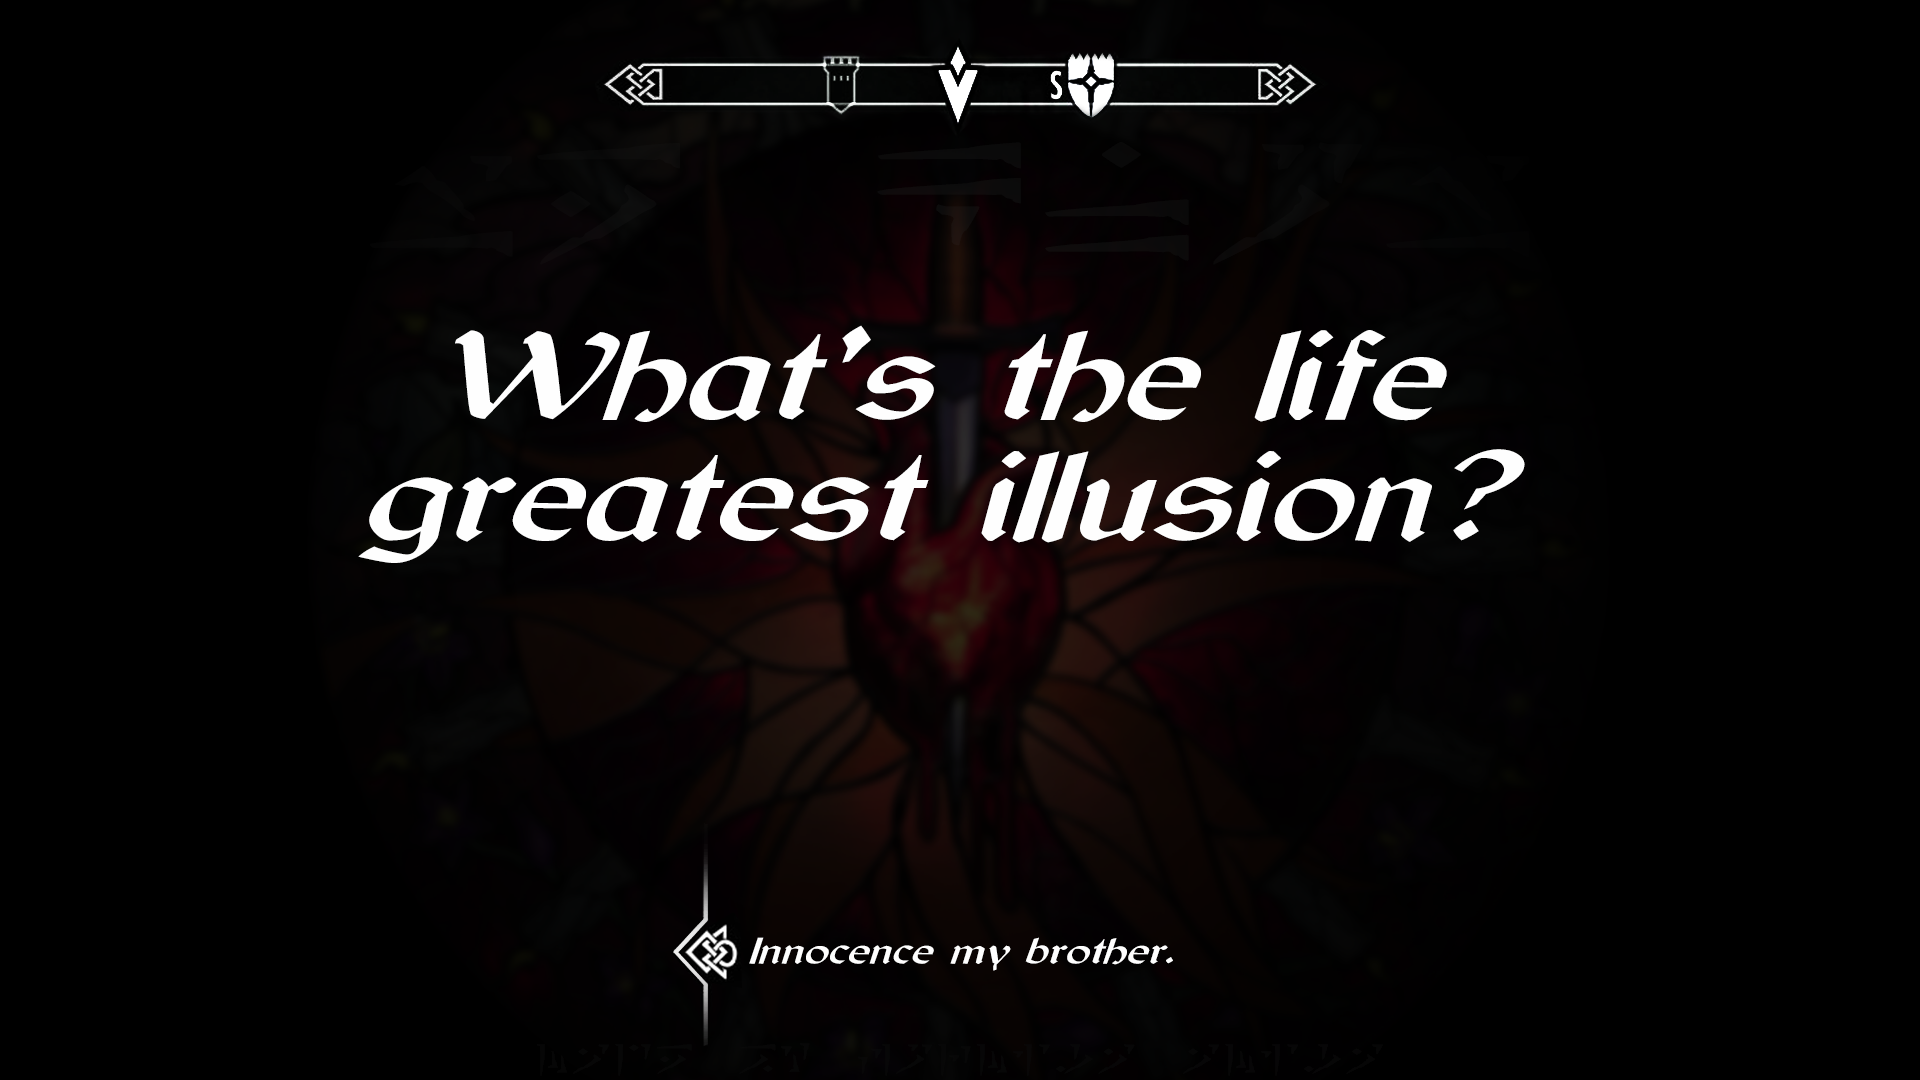 Dark Brotherhood Wallpaper Created By Myself Enjoy It